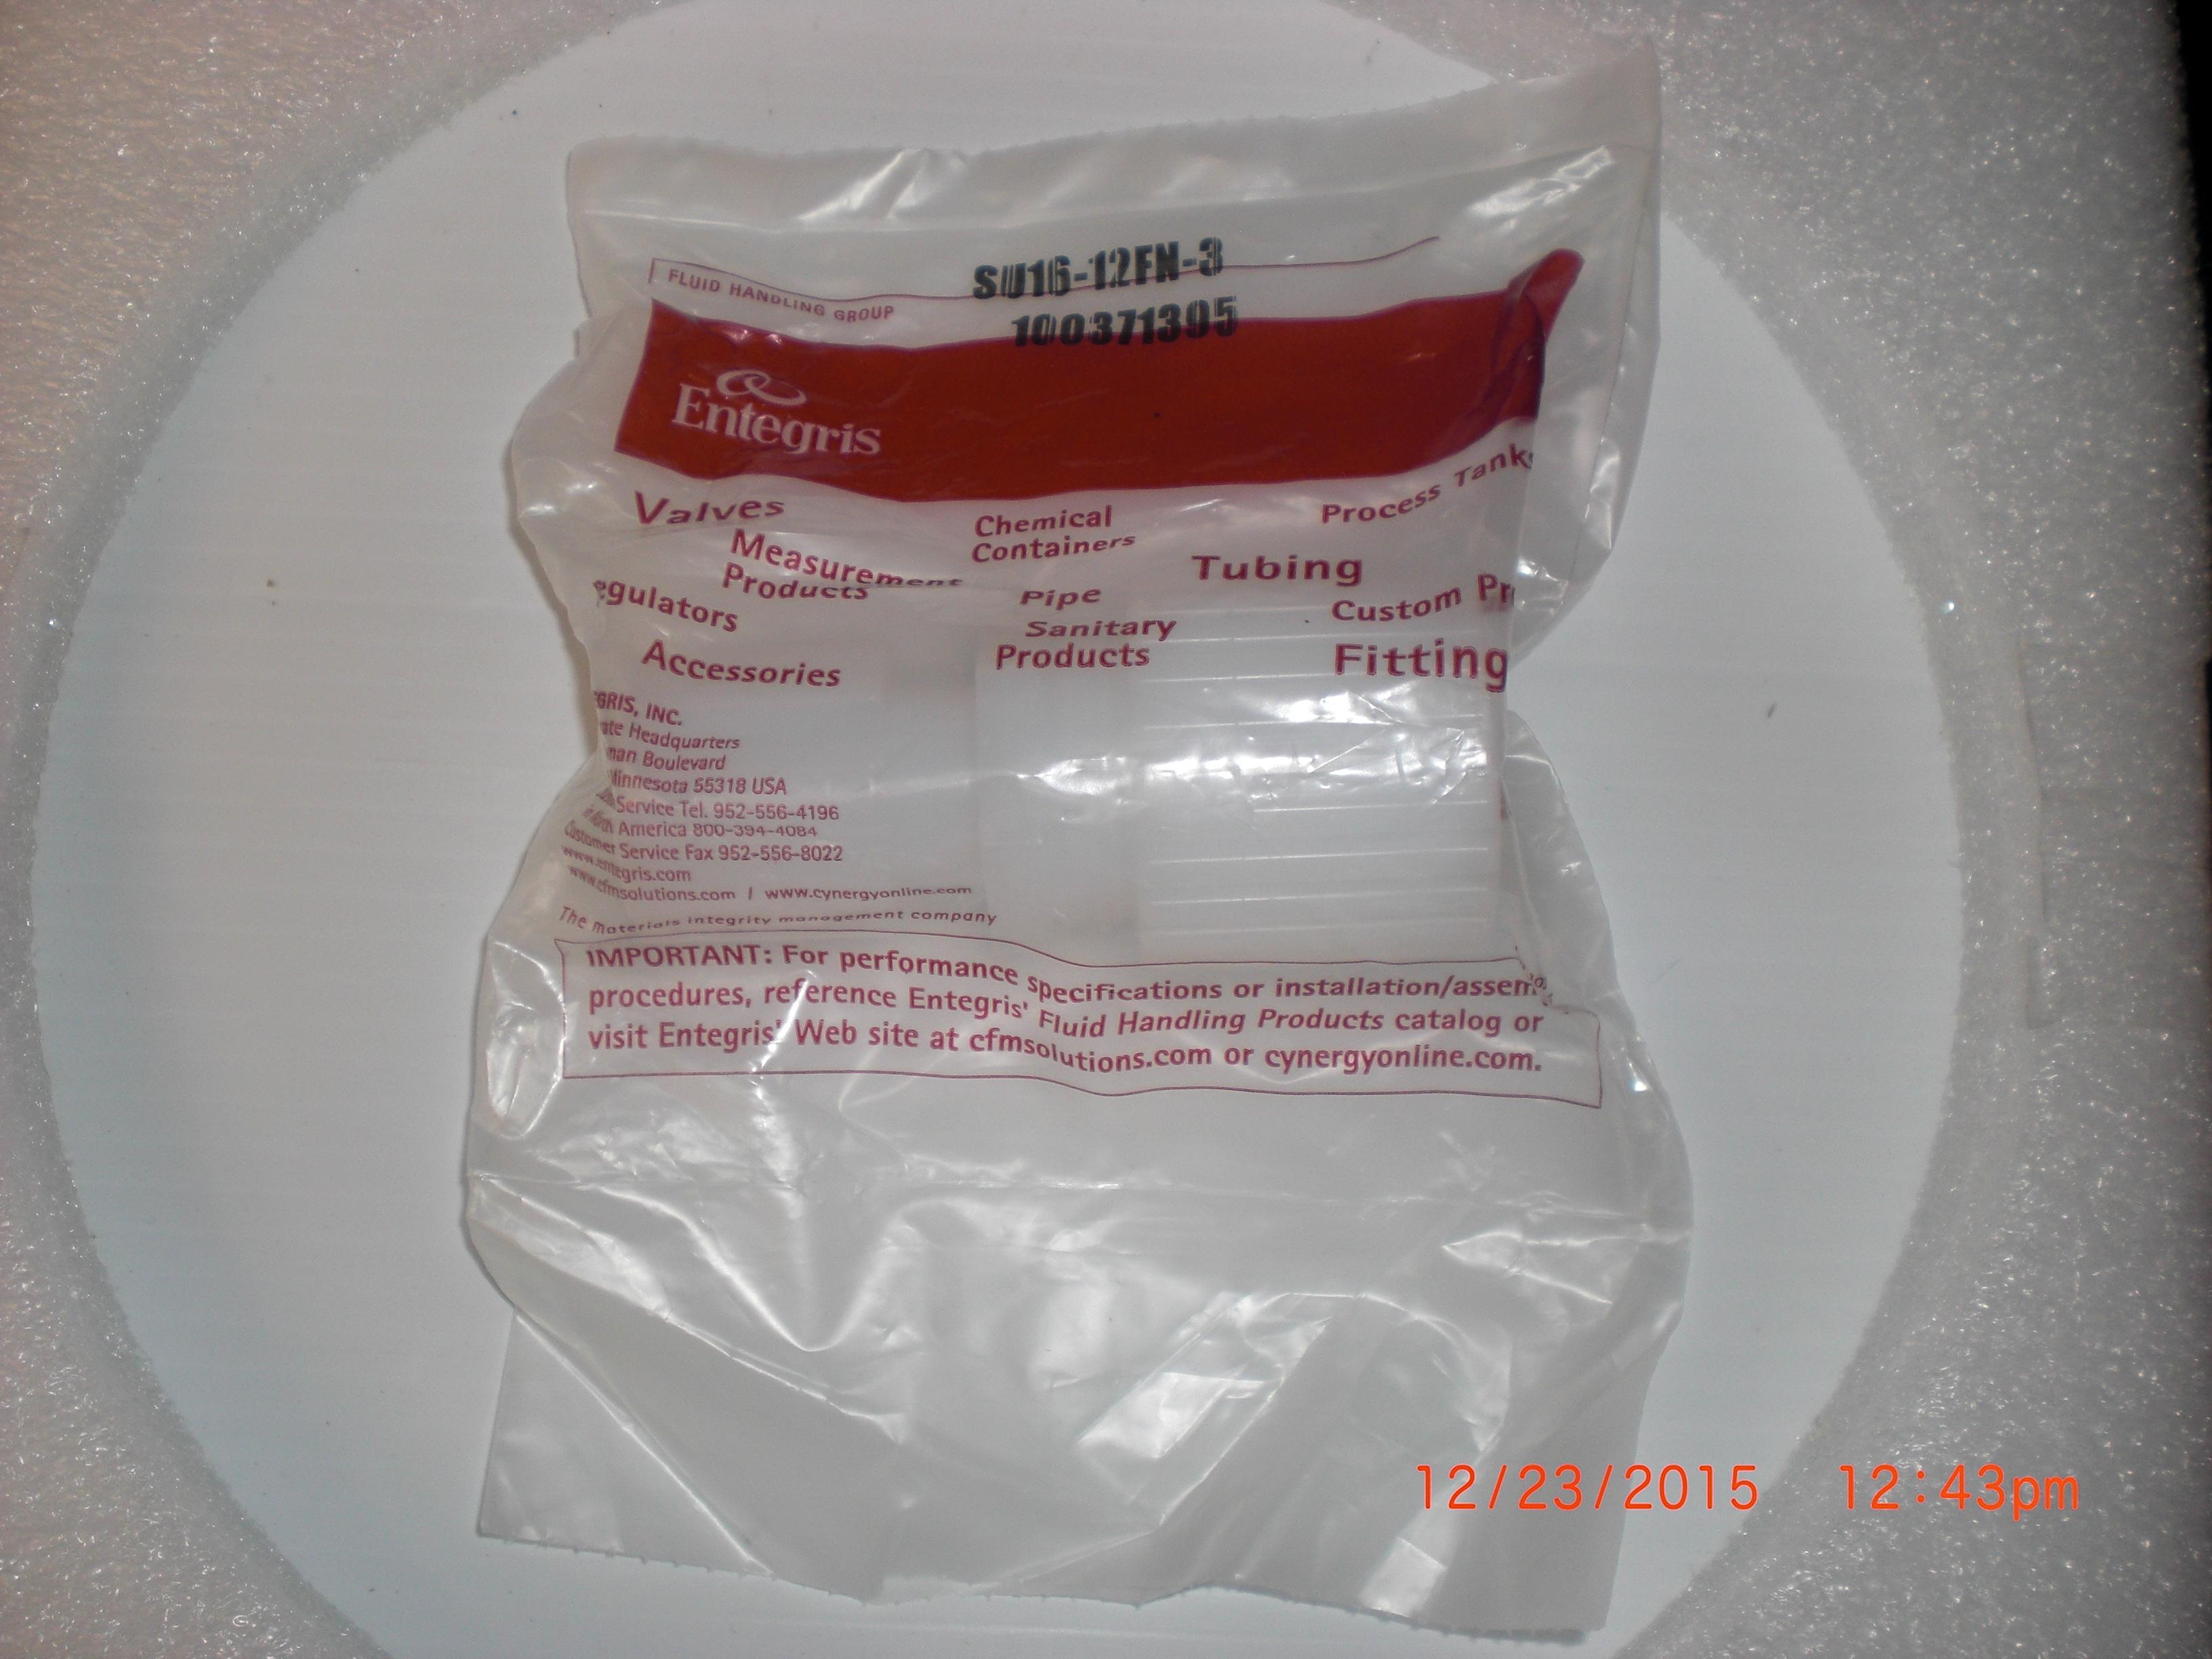 Fitting ENTEGRIS SU16-12FN-3 1 X 3/4 tube reducer Flare